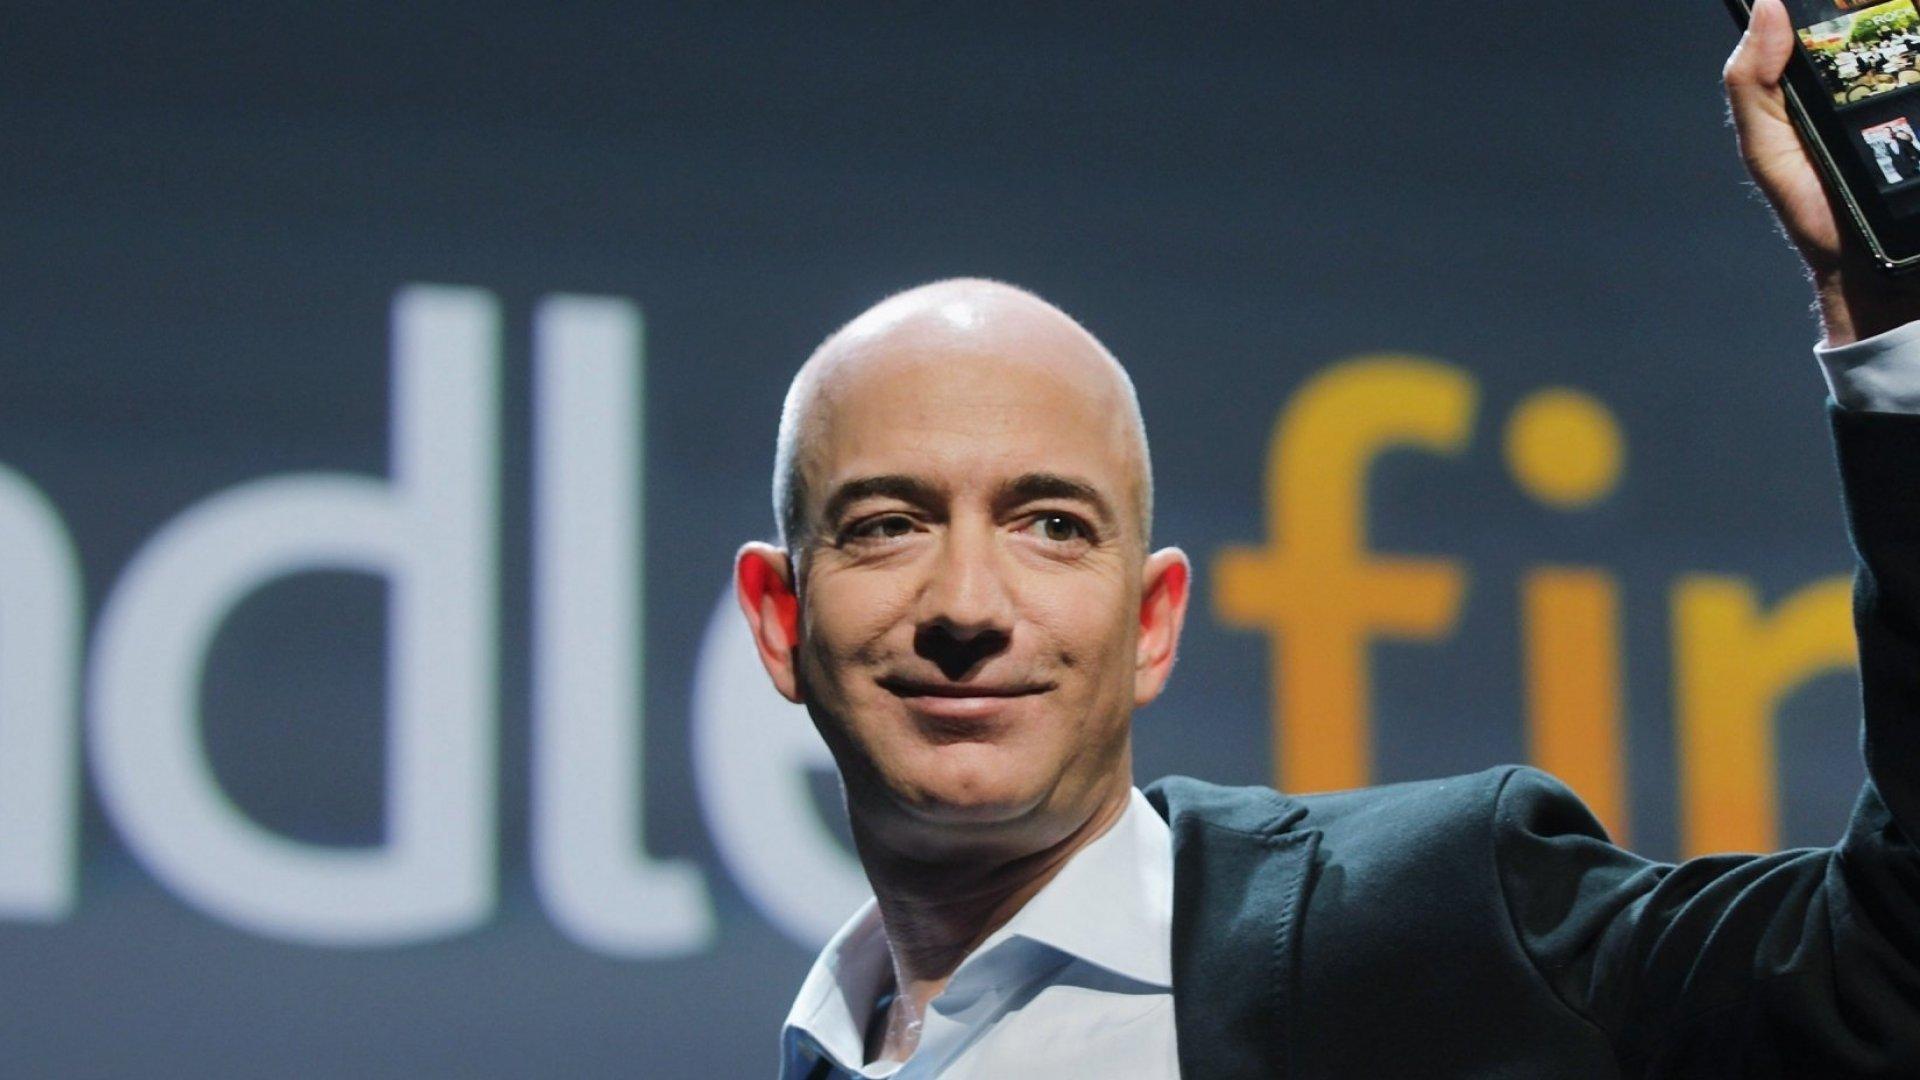 Meet the 15 Wealthiest Entrepreneurs of 2016